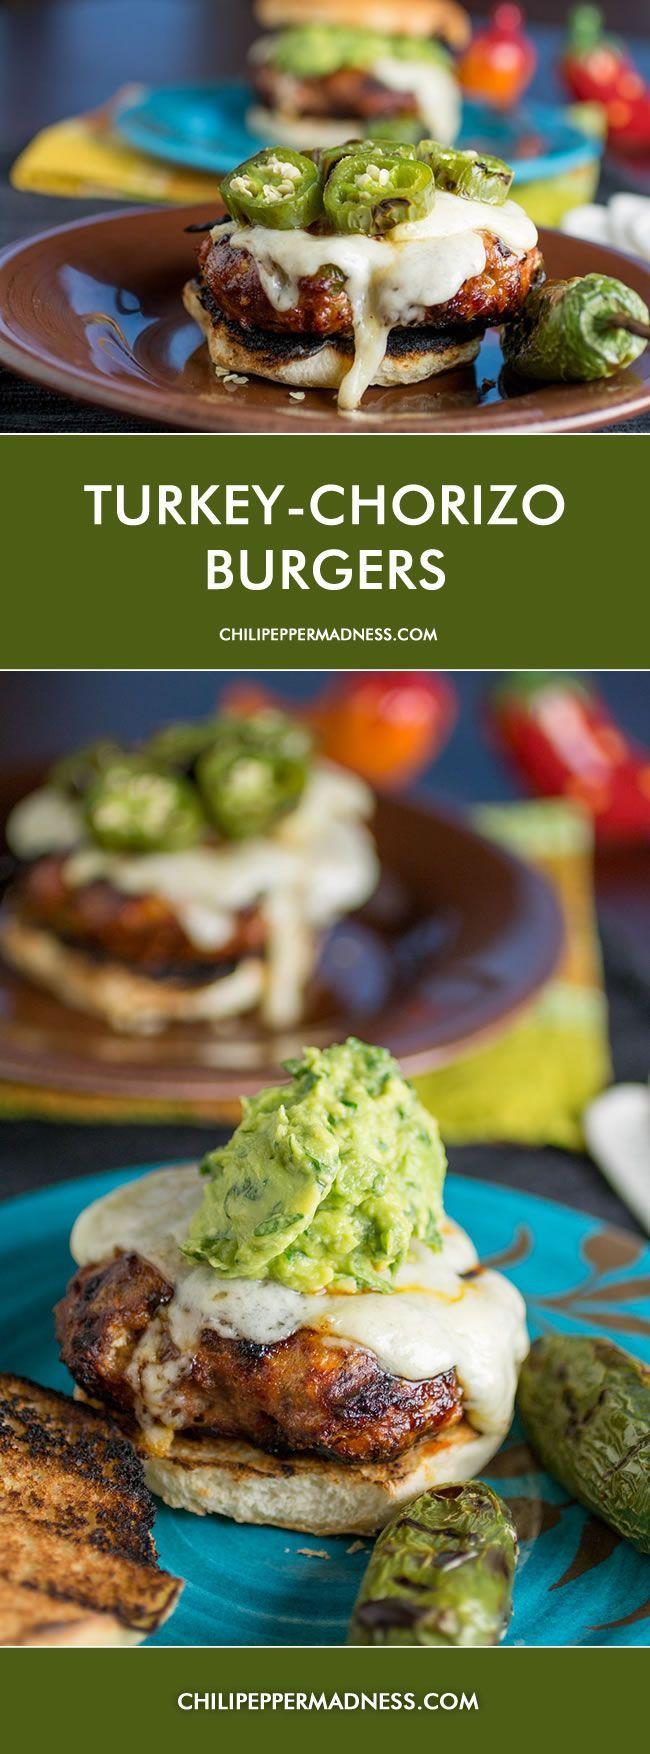 Turkey-Chorizo Burgers with Creamy Guacamole from ChiliPepperMadness.com